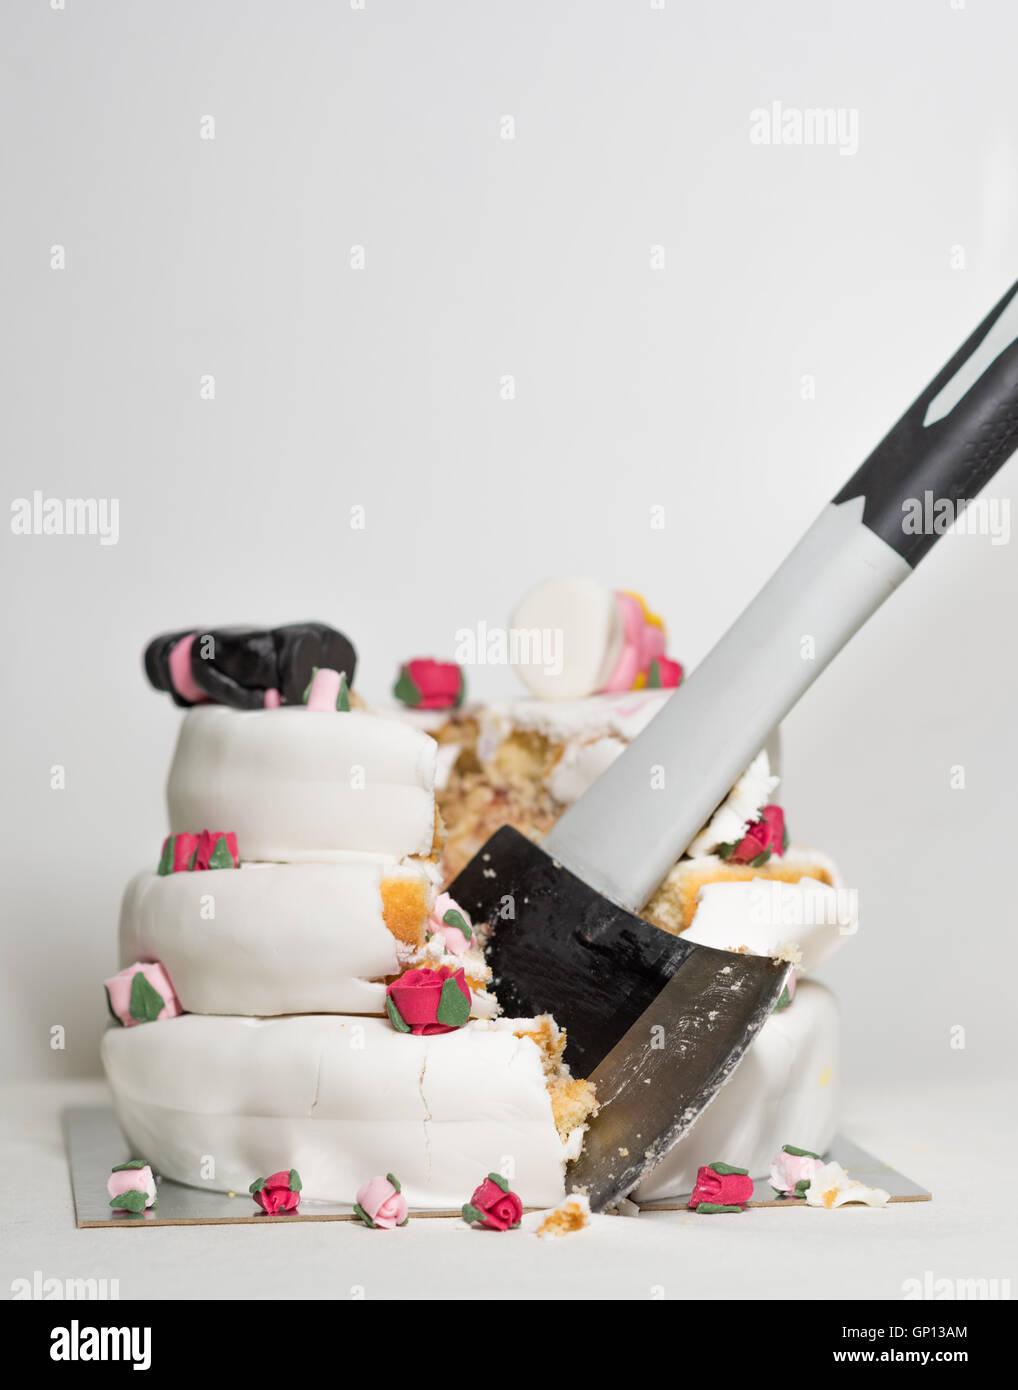 Divorce Cake Stock Photos & Divorce Cake Stock Images - Alamy